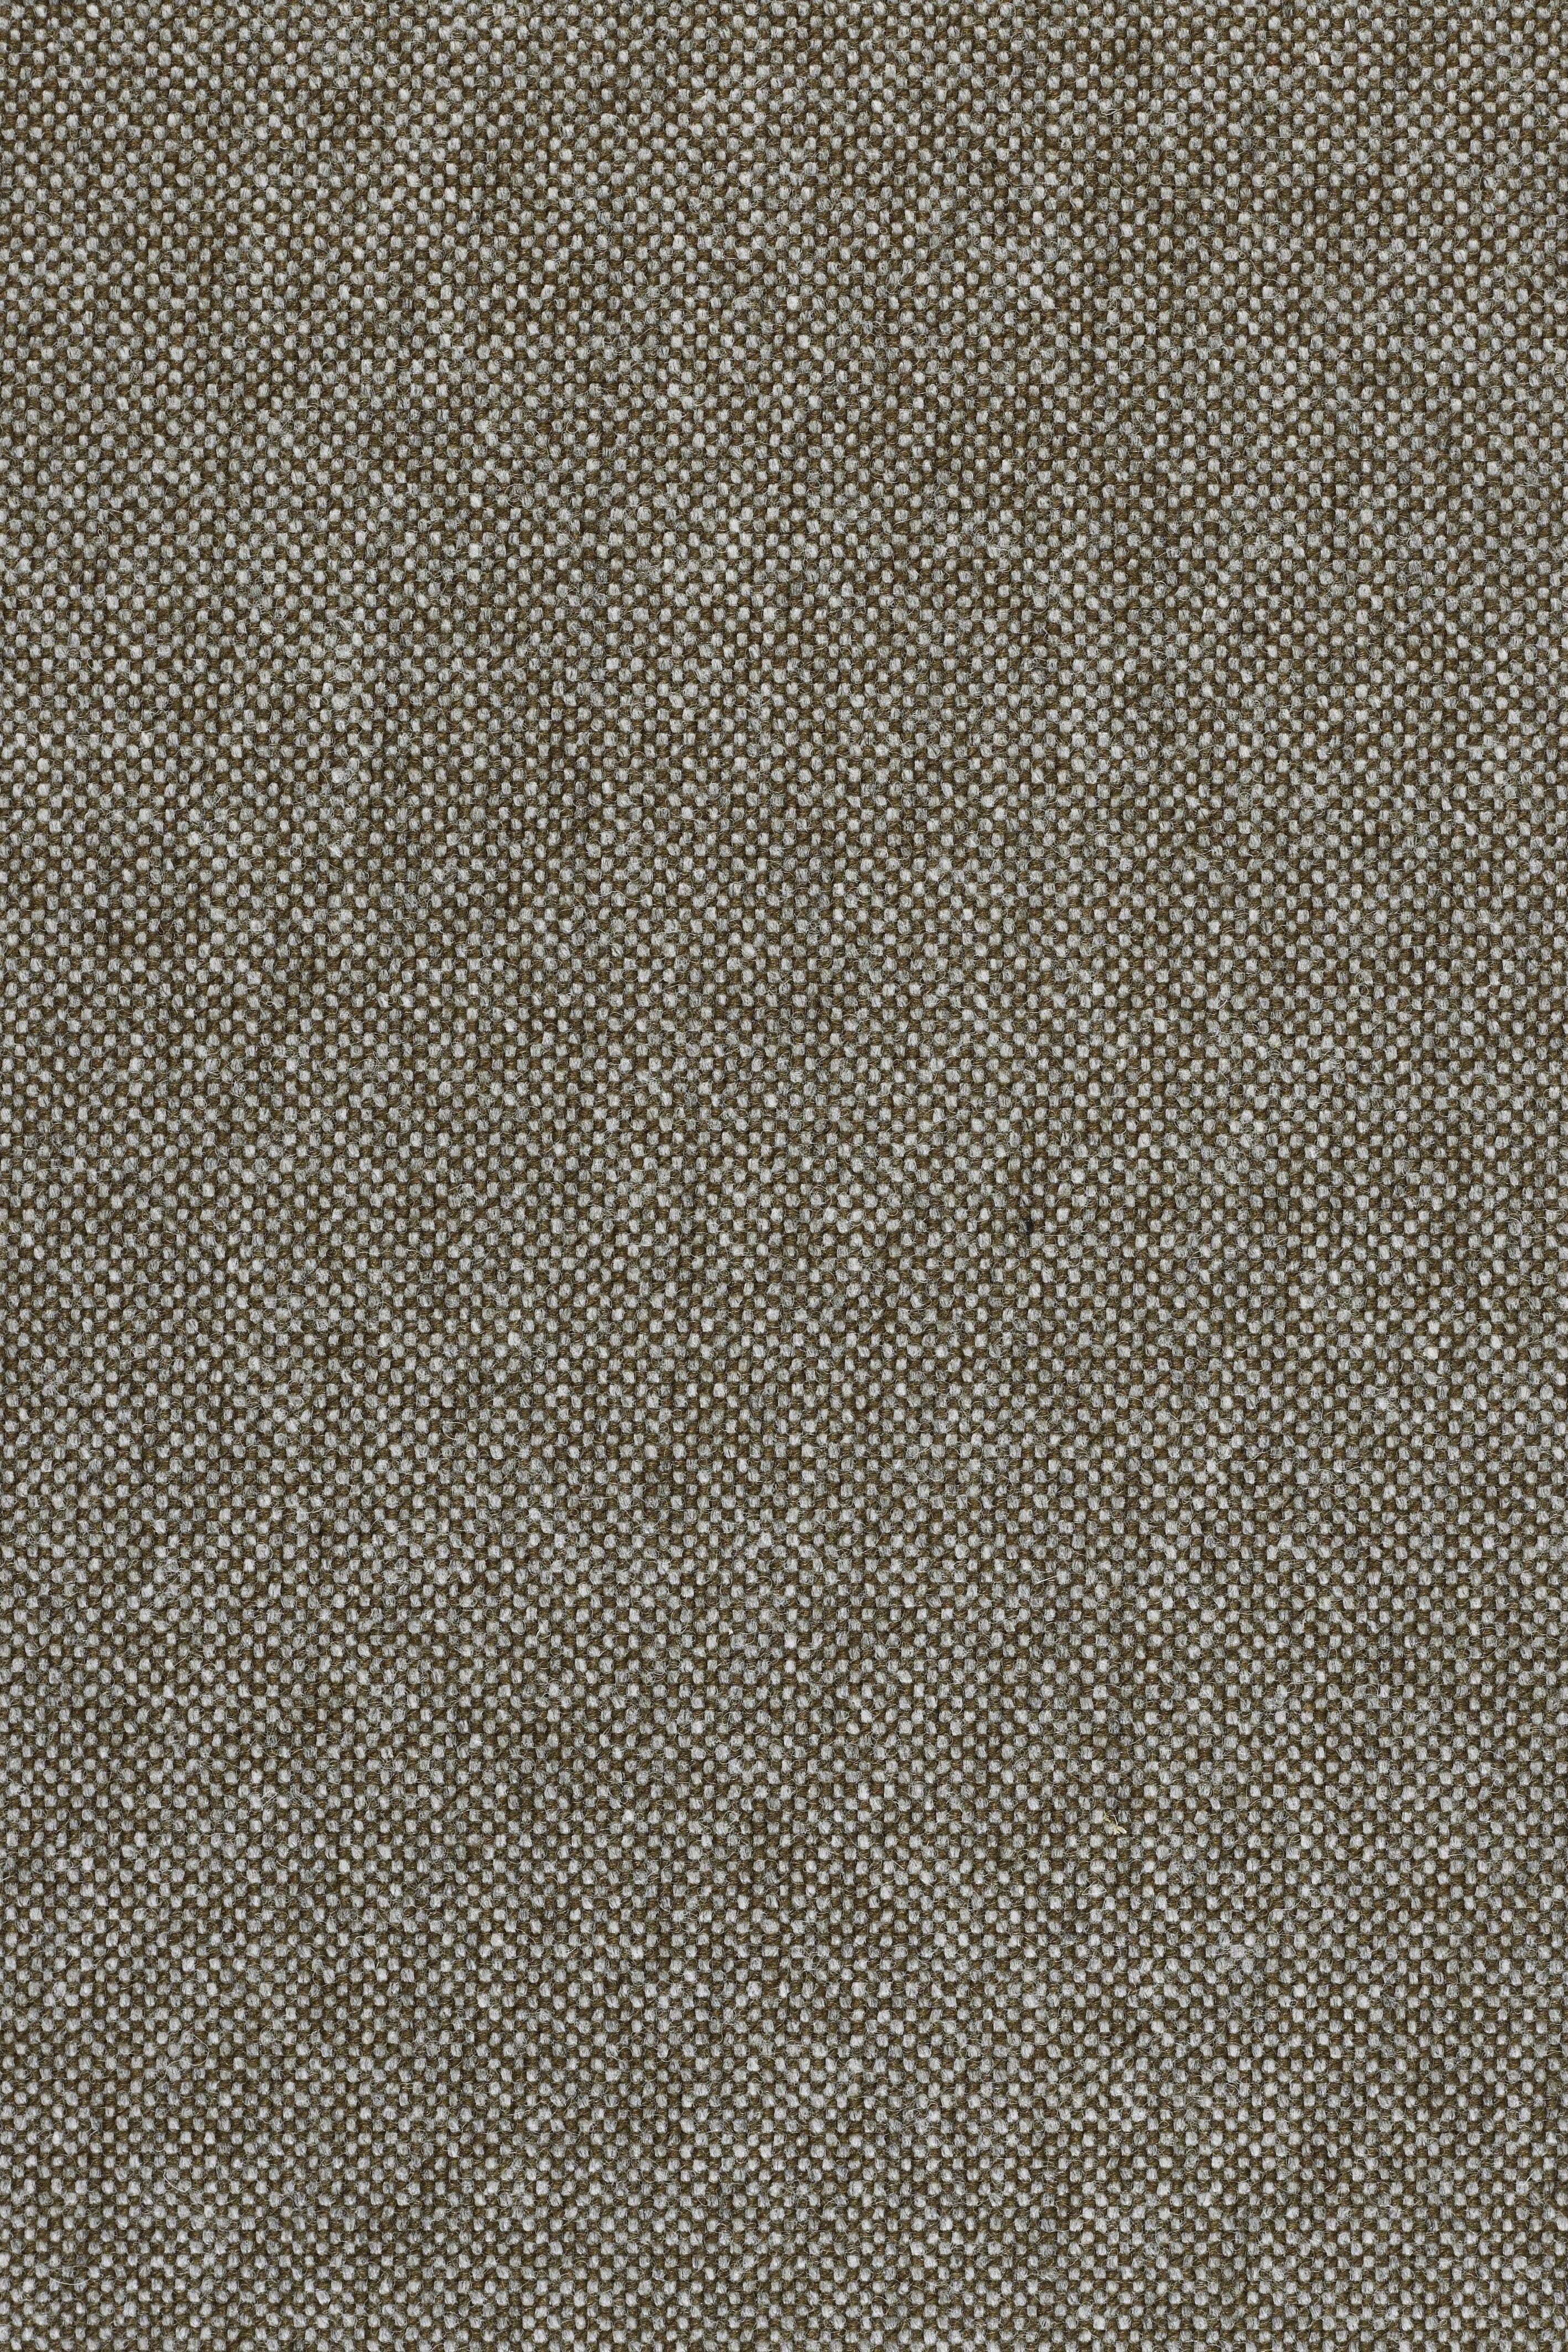 Hallingdal 65 Kvadrat Contemporary Textiles Interior Fabric Fabric